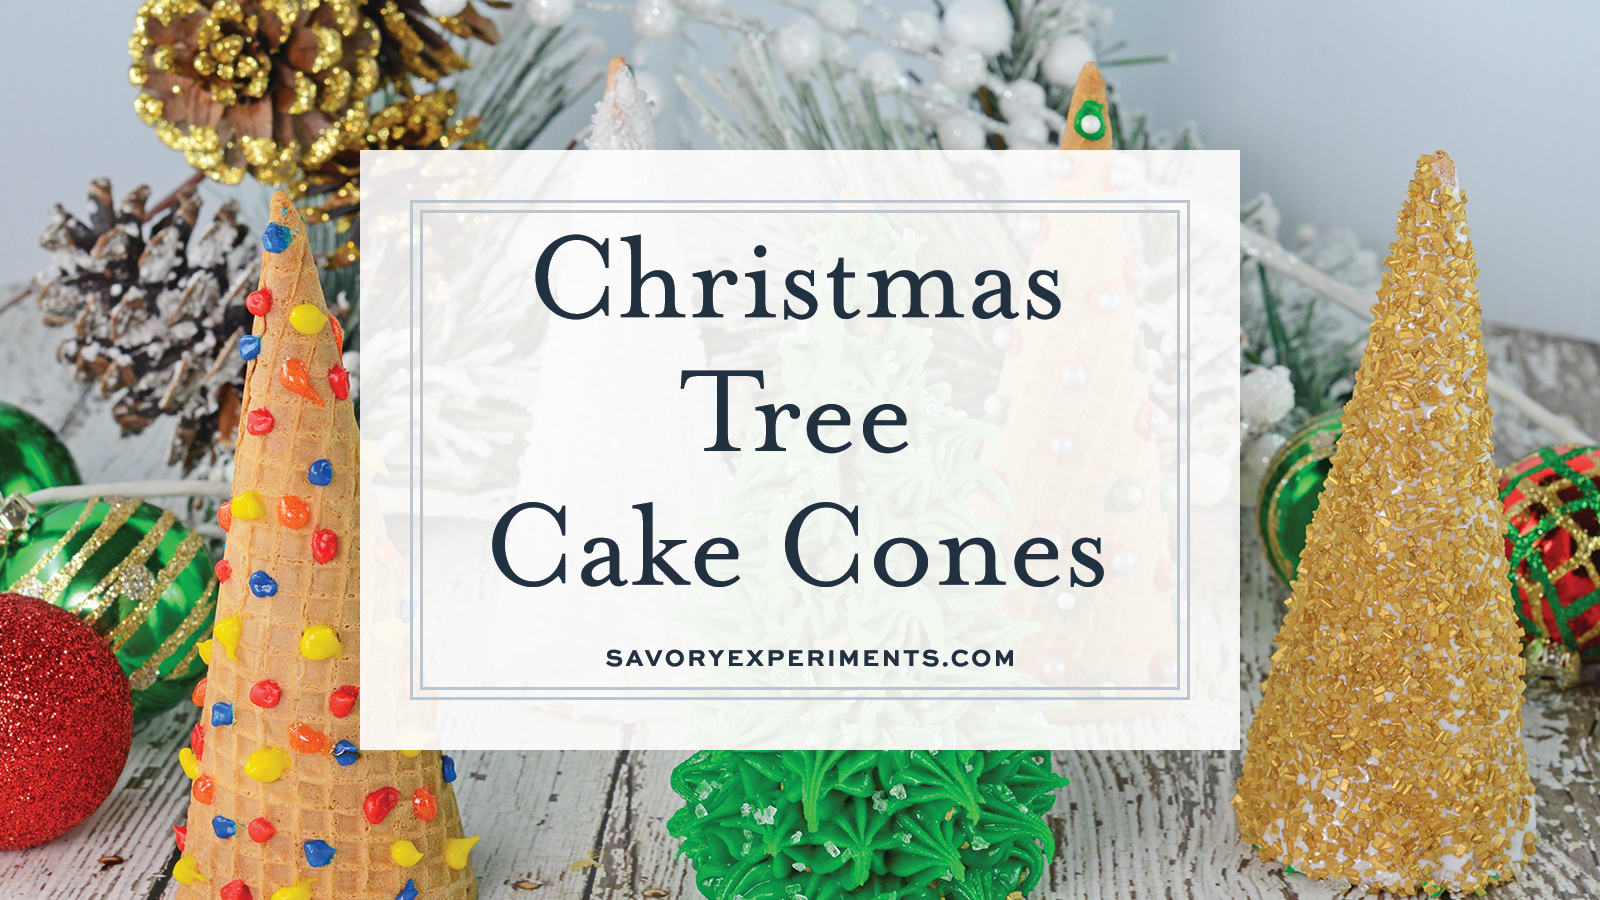 Christmas Tree Cake Cones + VIDEO - A Fun Christmas Dessert